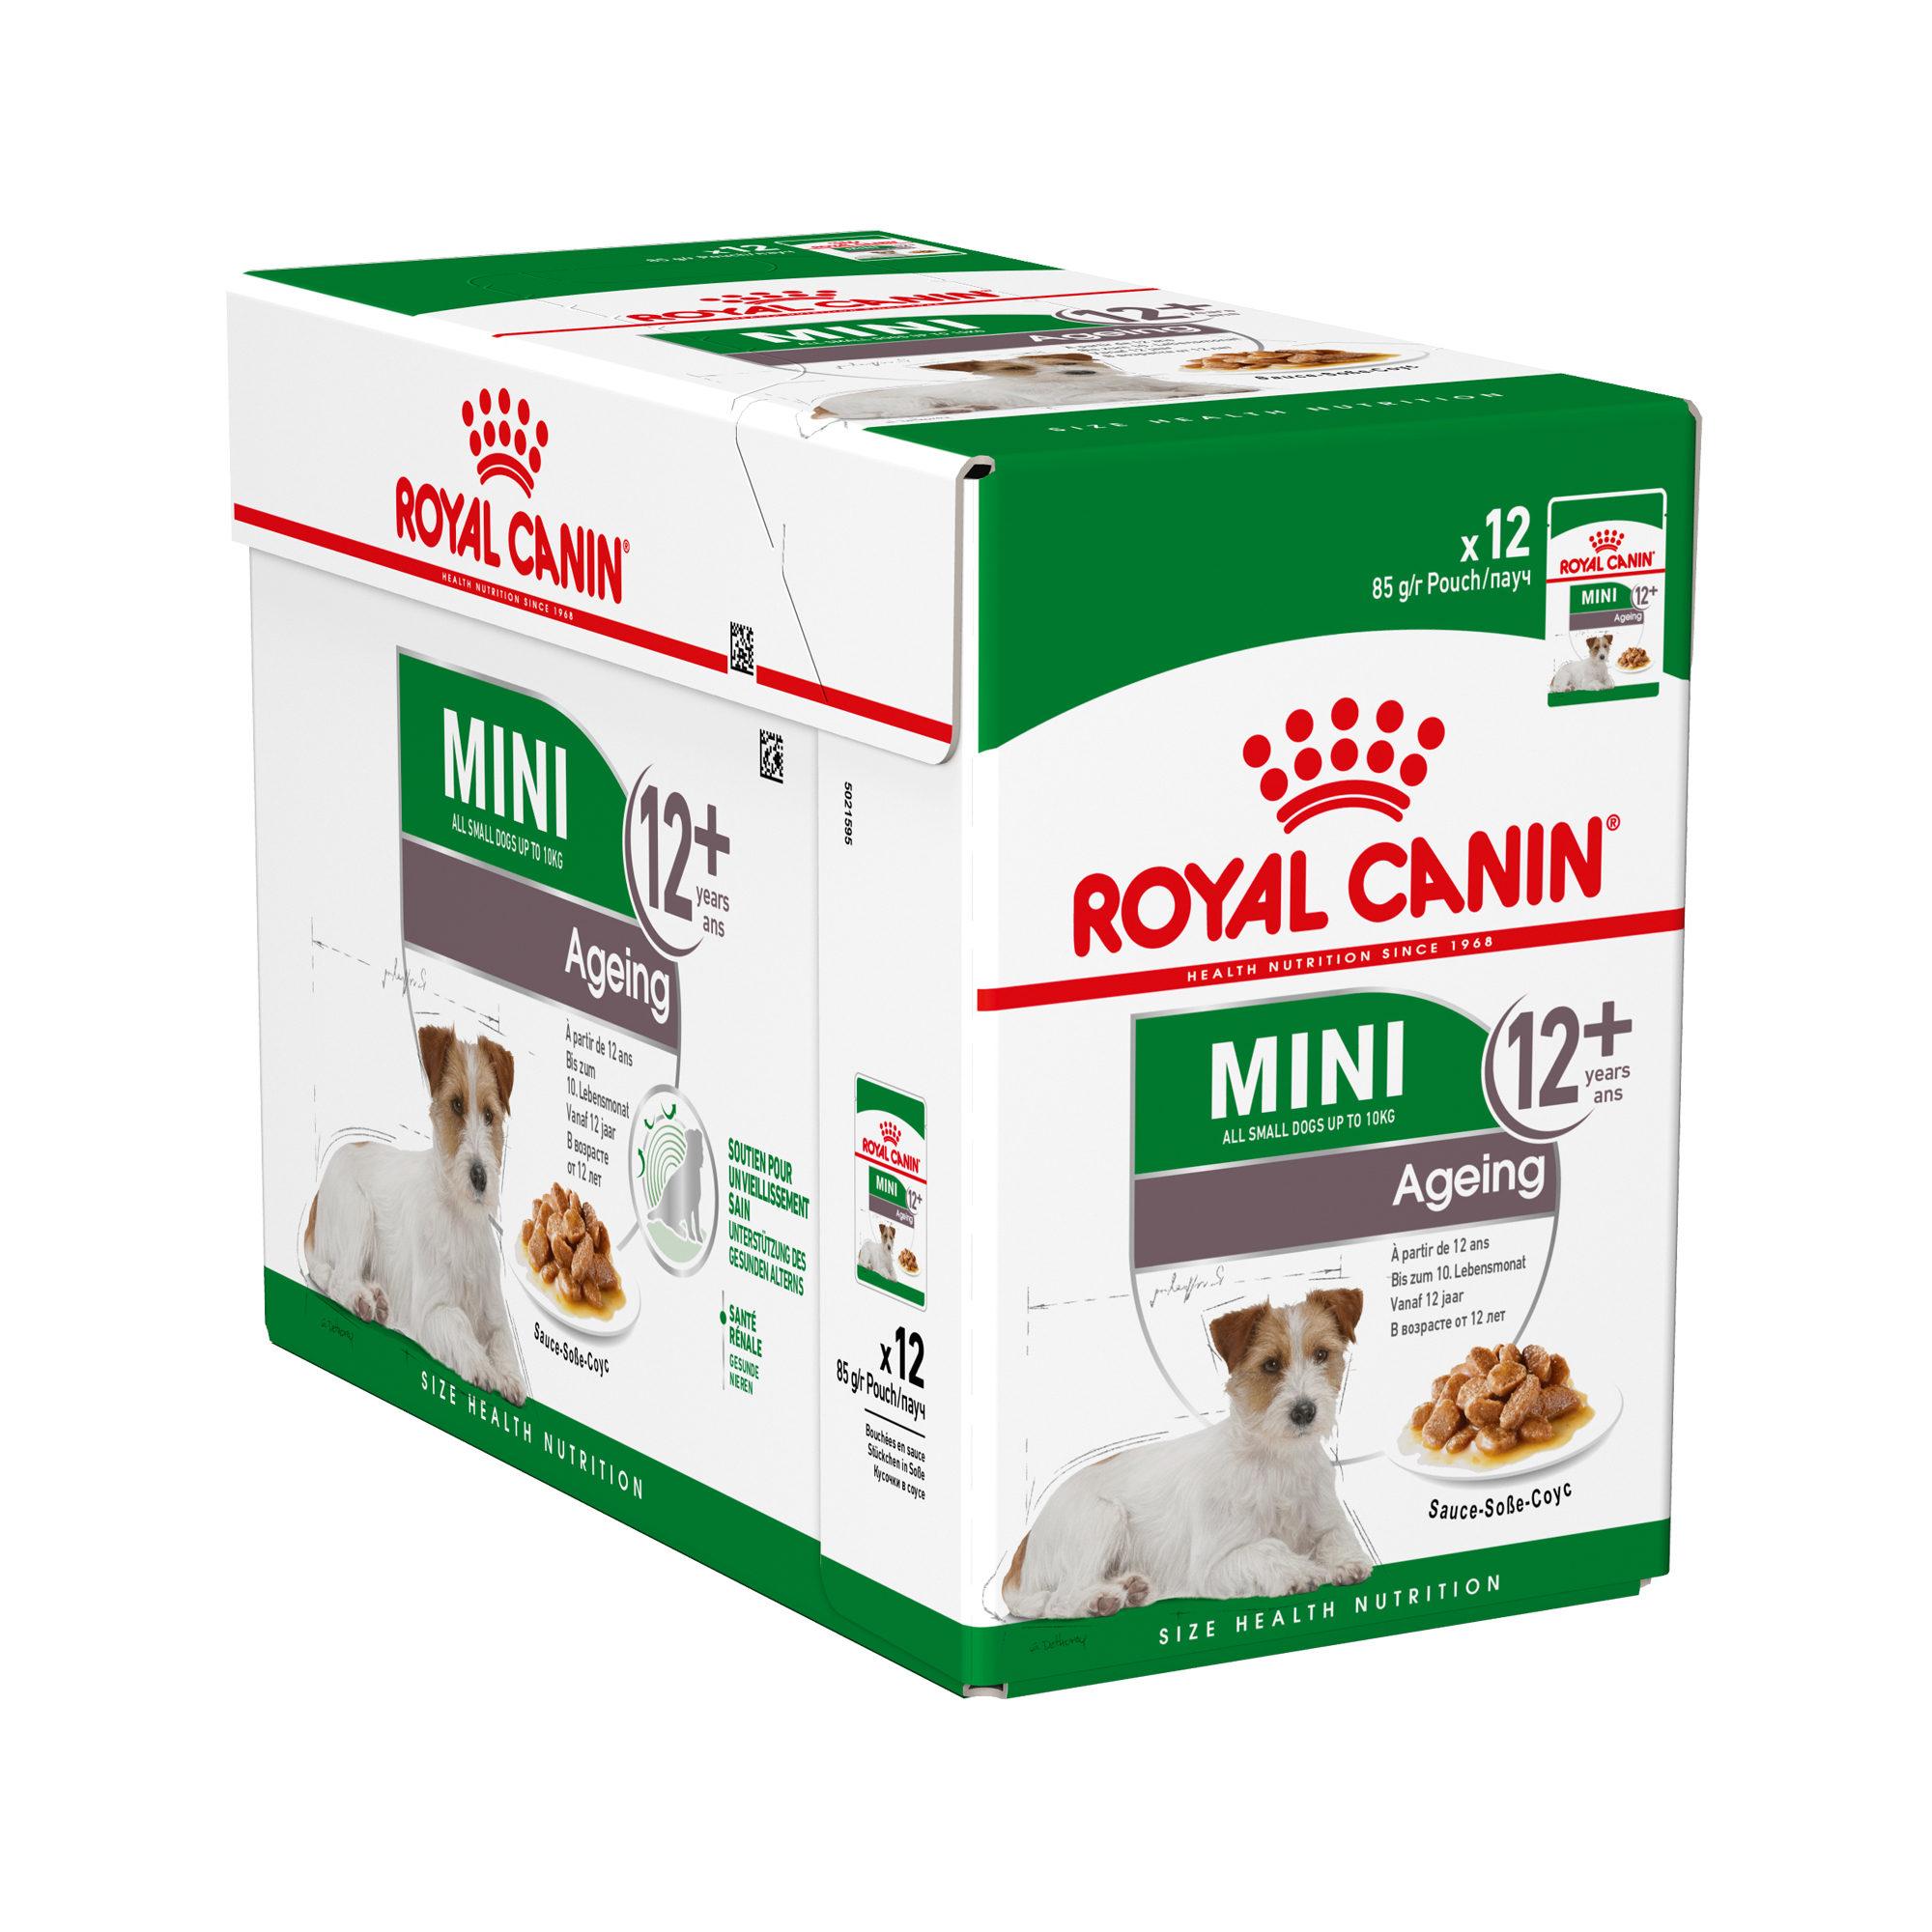 Royal Canin Mini Ageing 12+ Hundefutter - Frischebeutel